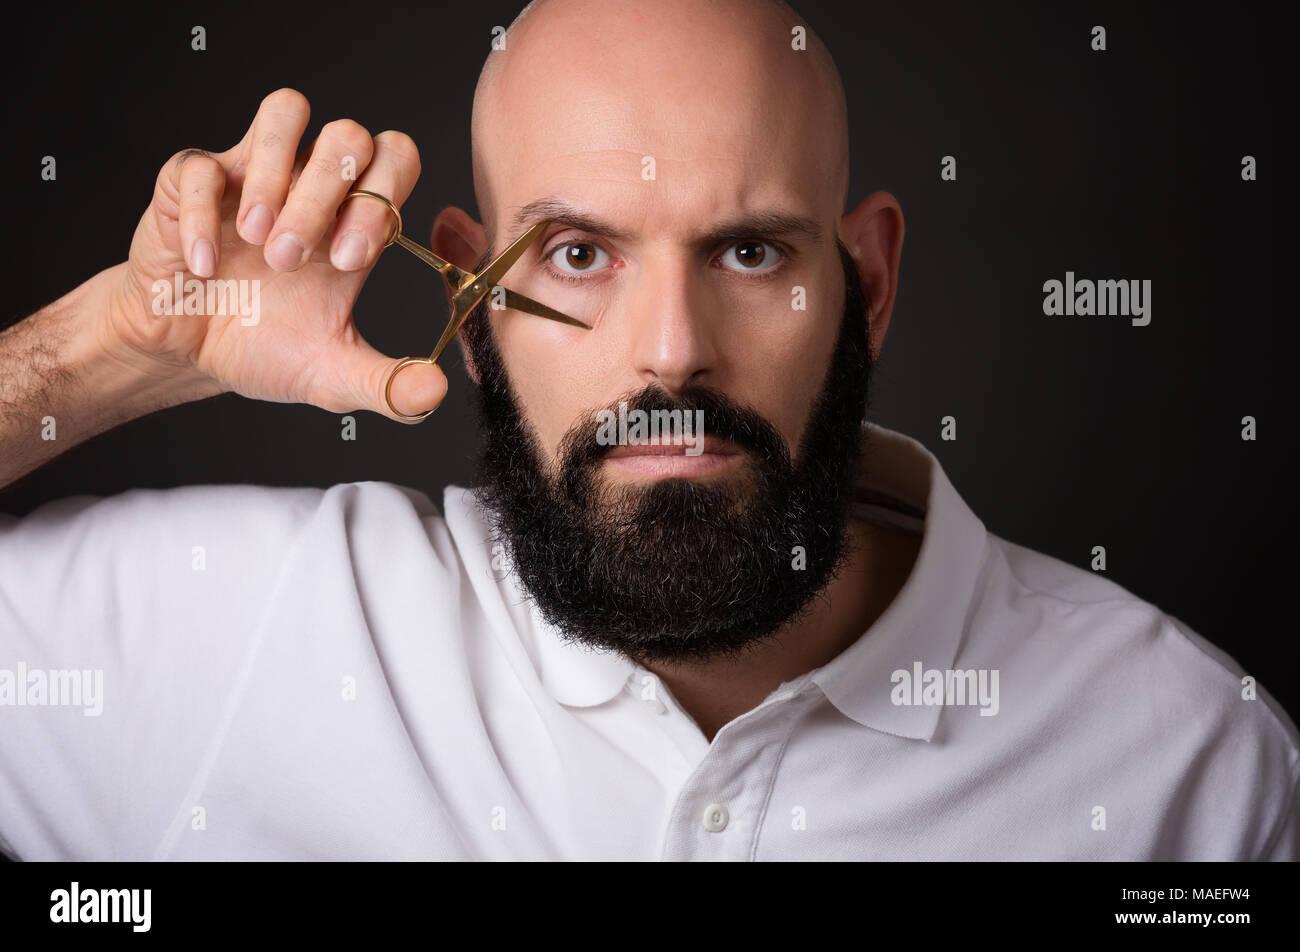 Portrait of bald bearded man holding scissors on his eye over dark background Stock Photo